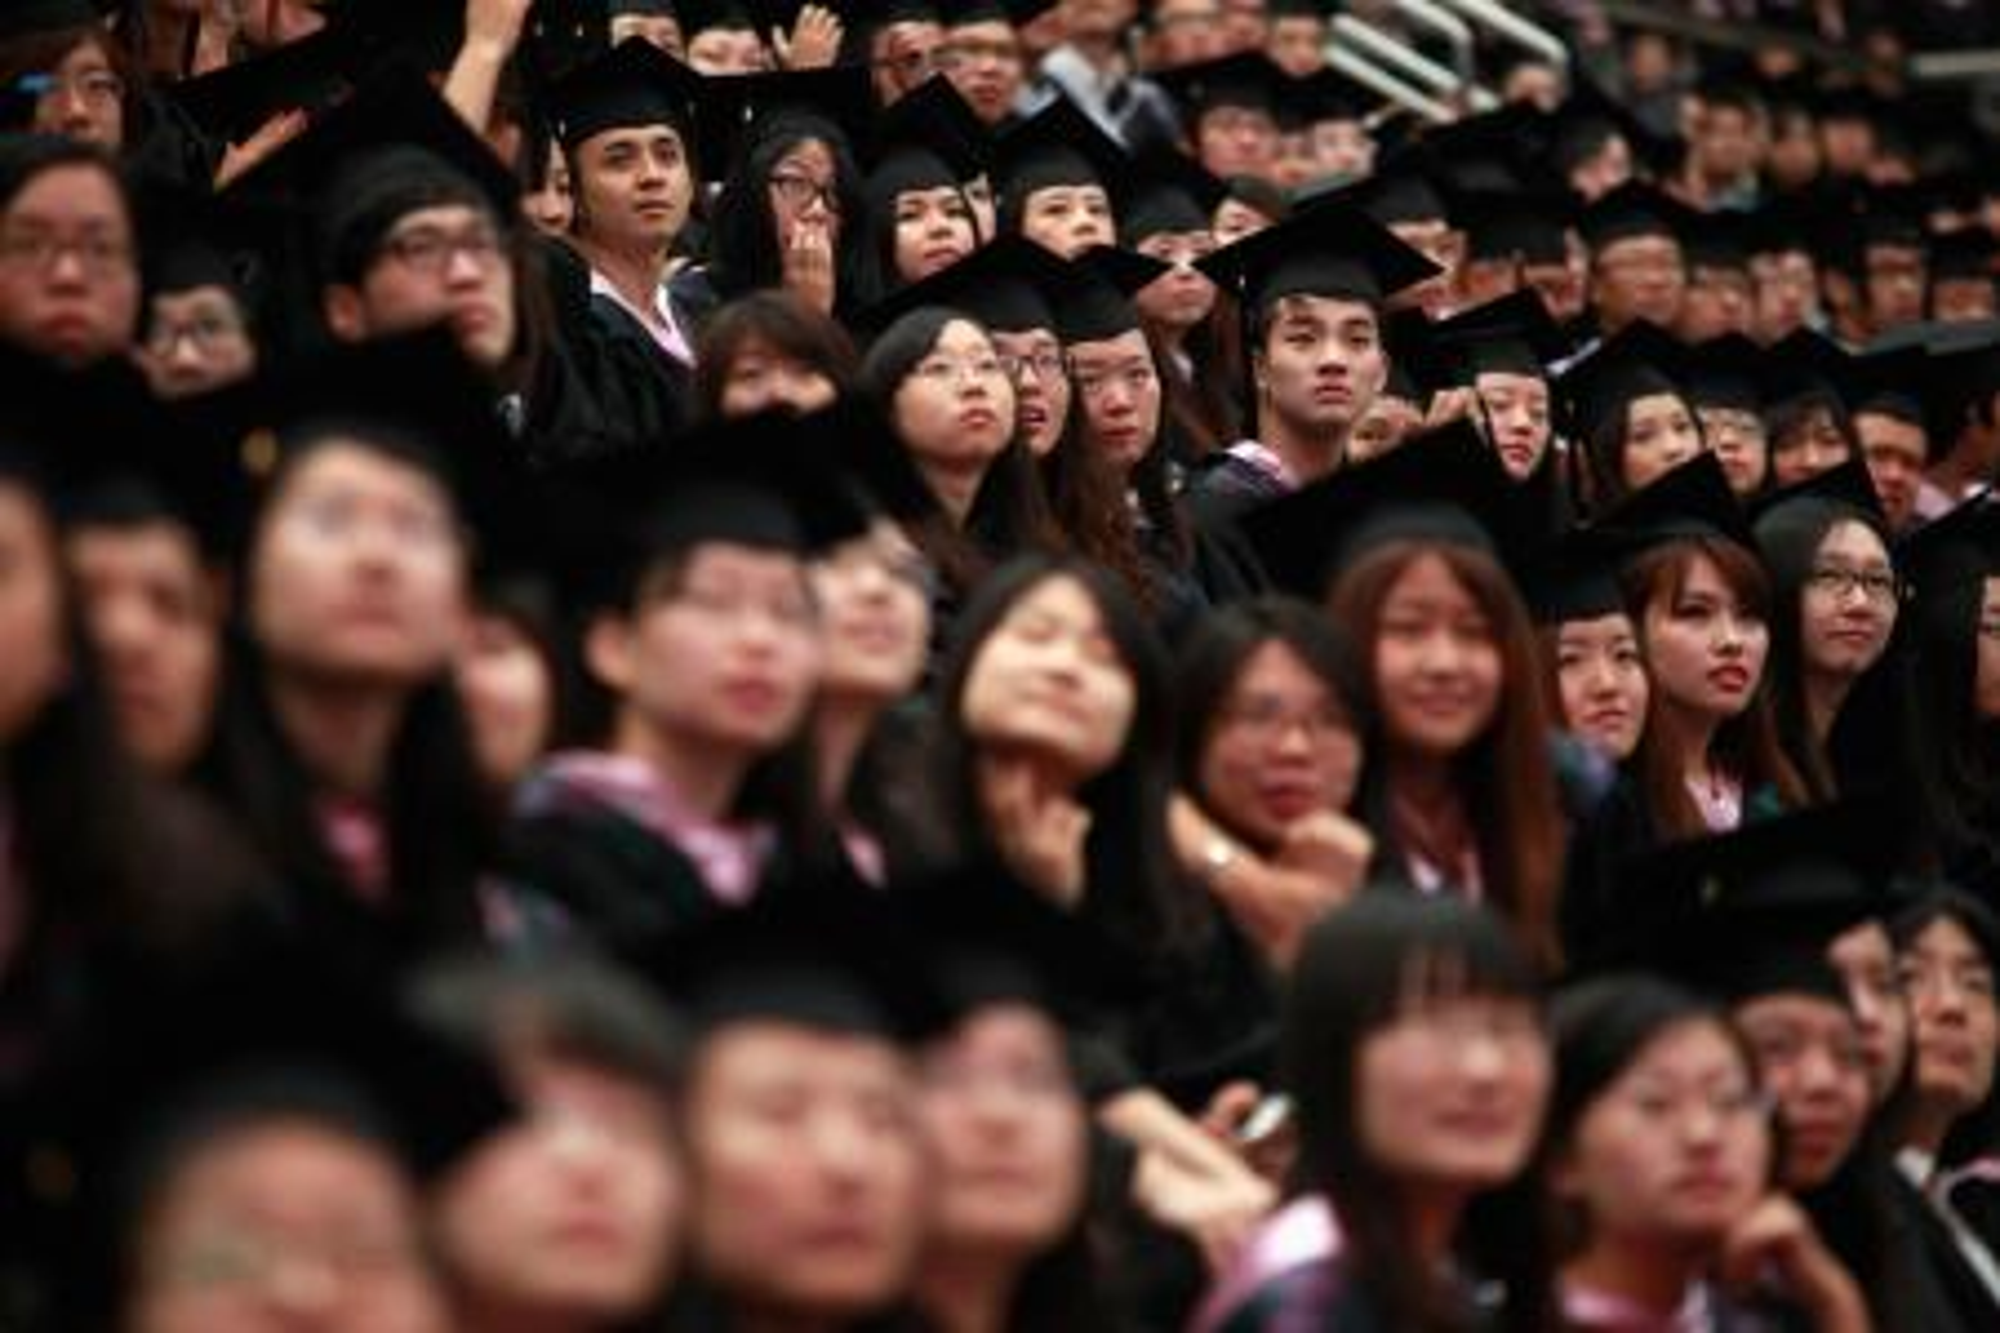 Graduates attend a graduation ceremony at Fudan University in Shanghai